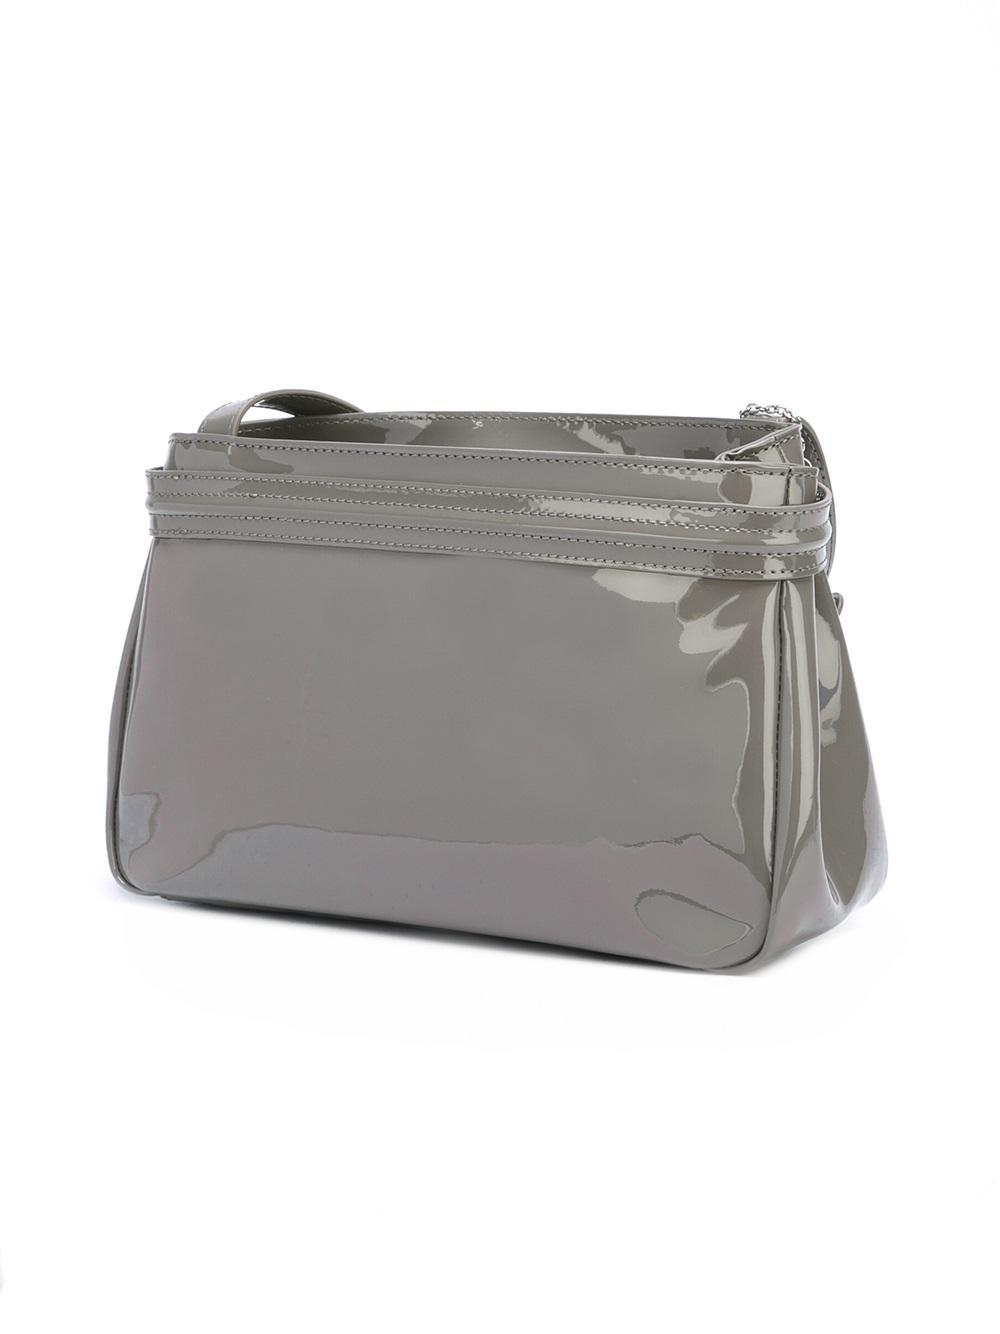 Lyst - Armani Jeans Logo Embossed Shoulder Bag in Gray c6d5fdd5b0b5e